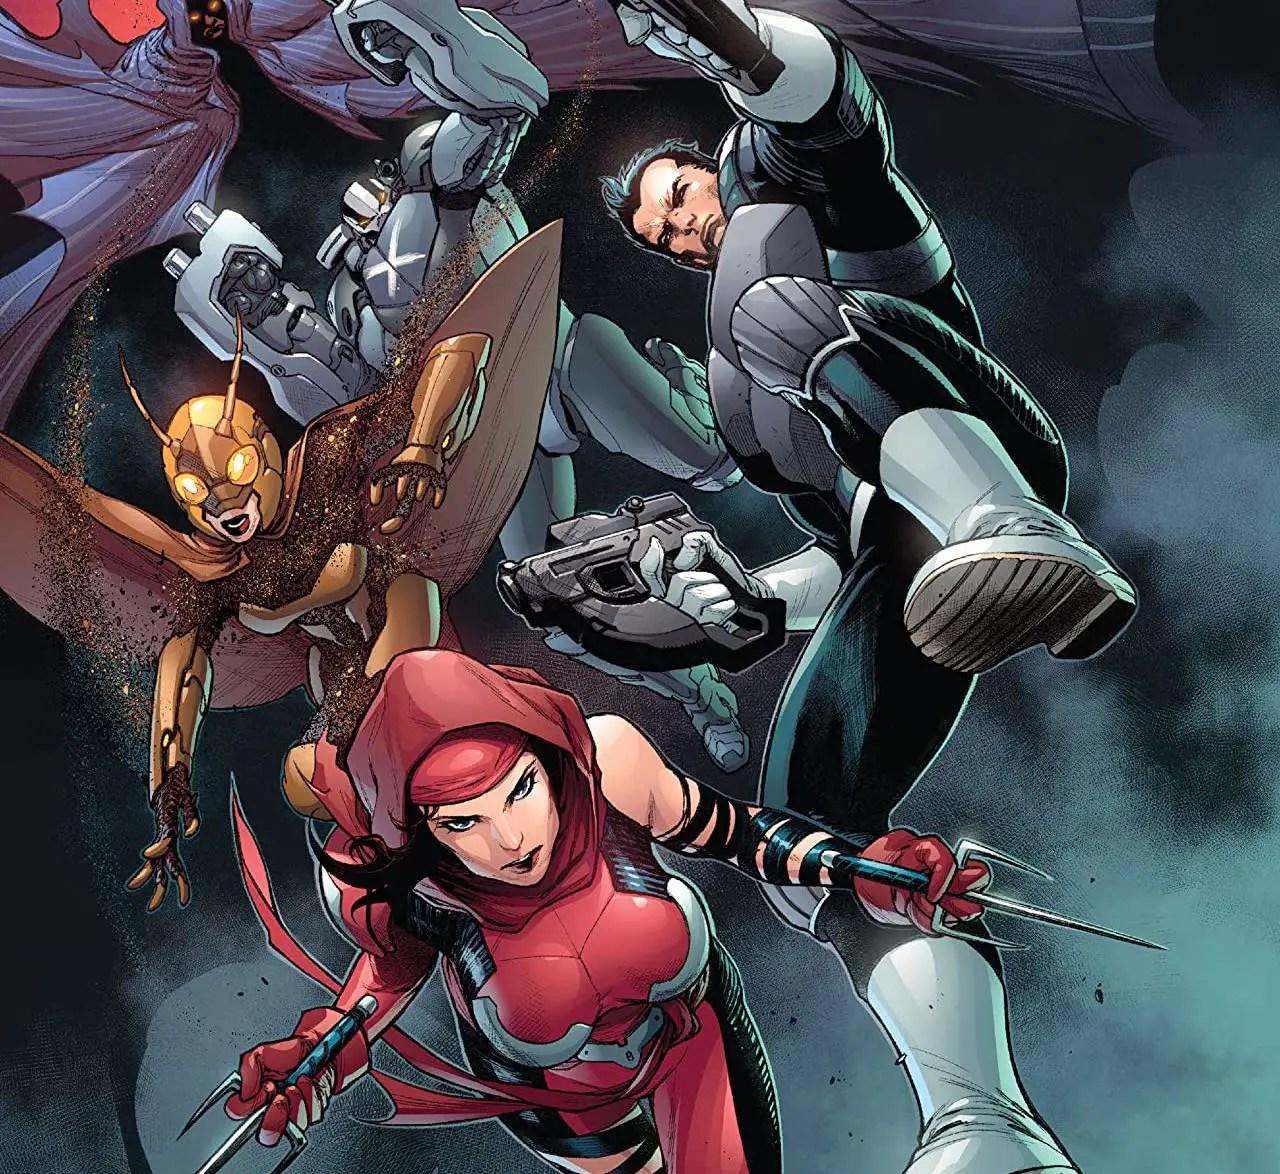 'Heroes Reborn: Squadron Savage' #1 puts a tragic twist on The Punisher